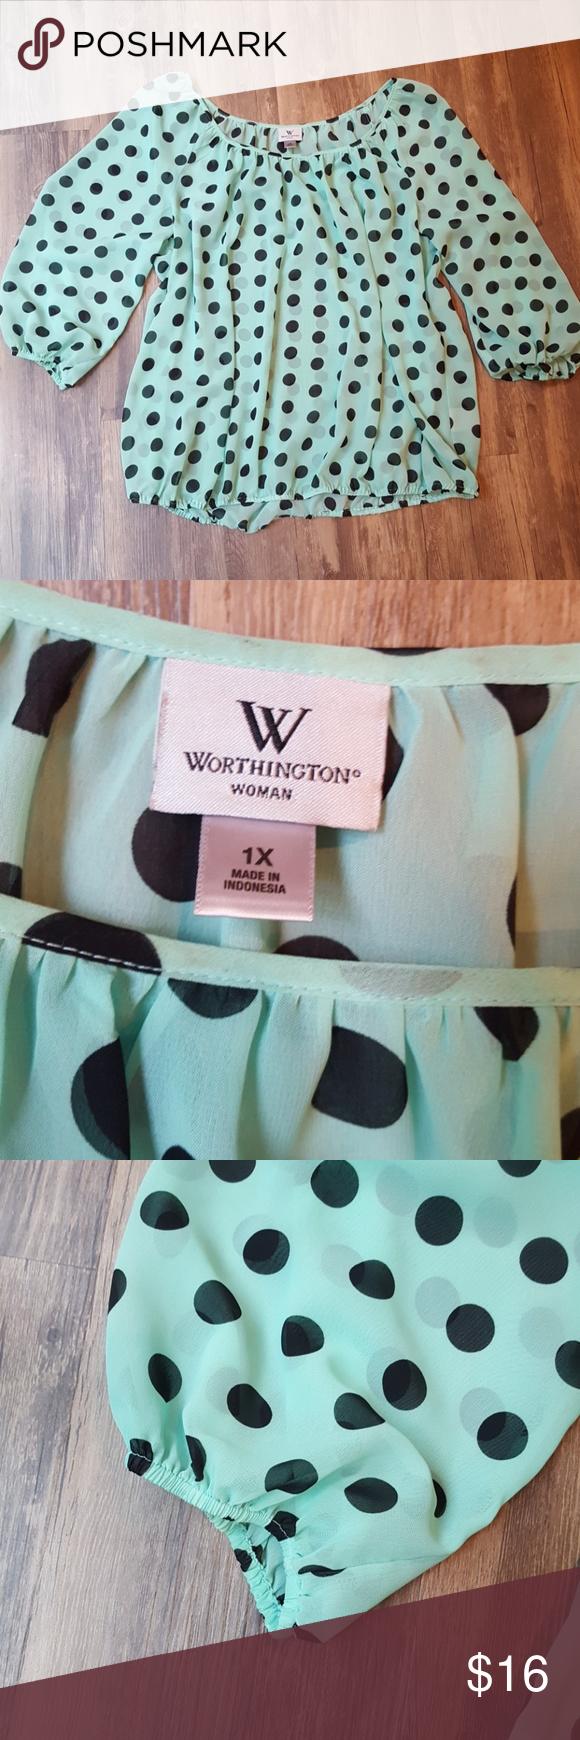 cff7a62f466416 Worthington Mint and black polka dot top Worthington woman 1X Minty green  and black polka dot blouse Sheer material Long sleeve Elastic cuff and  bottom ...